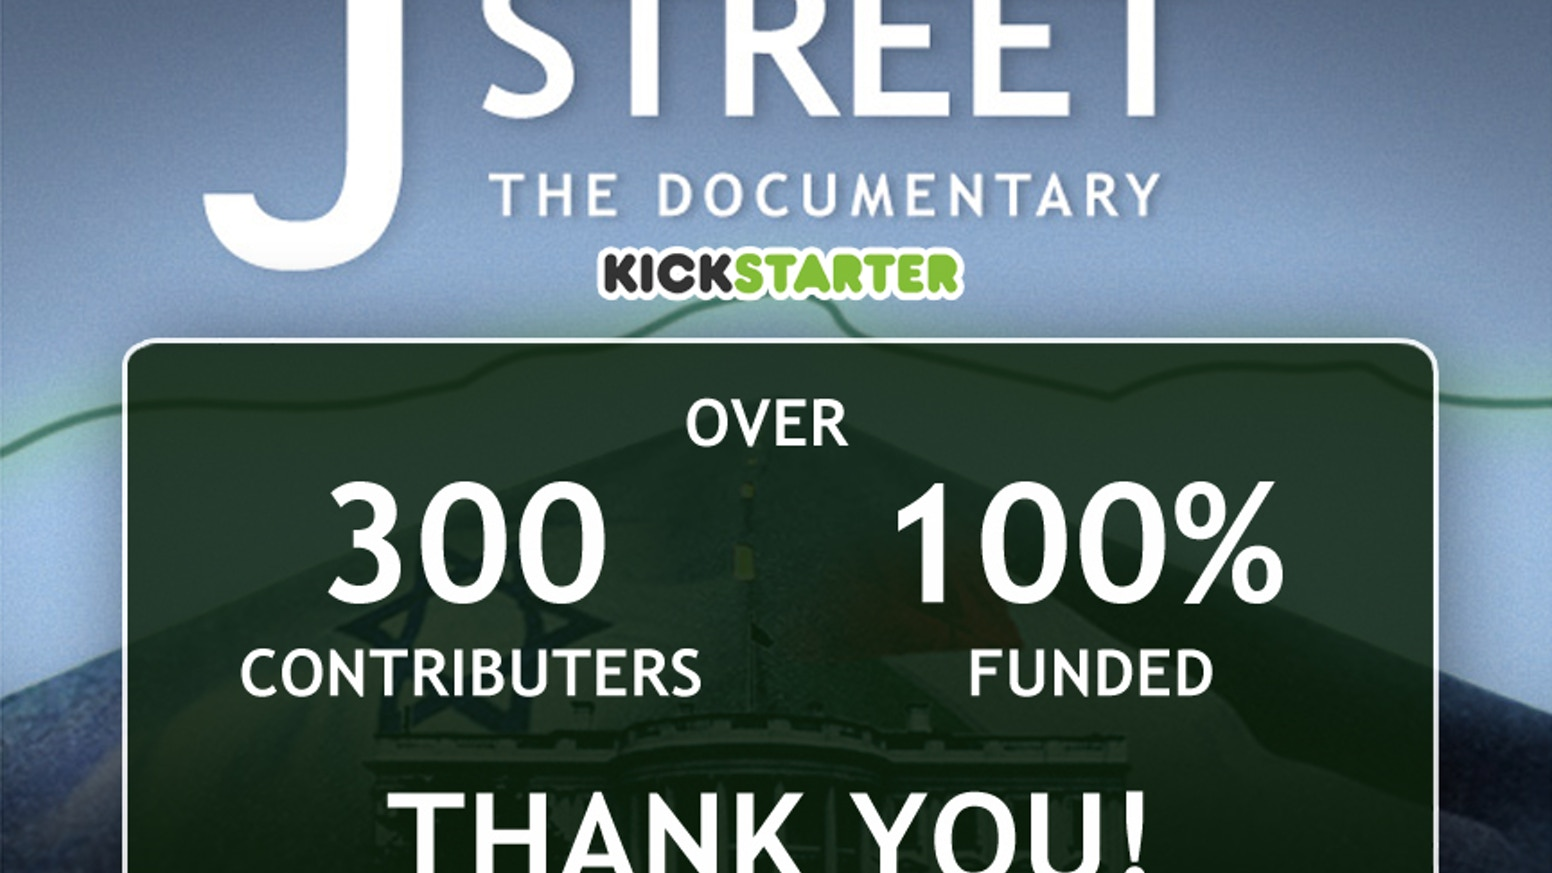 J Street: The Documentary